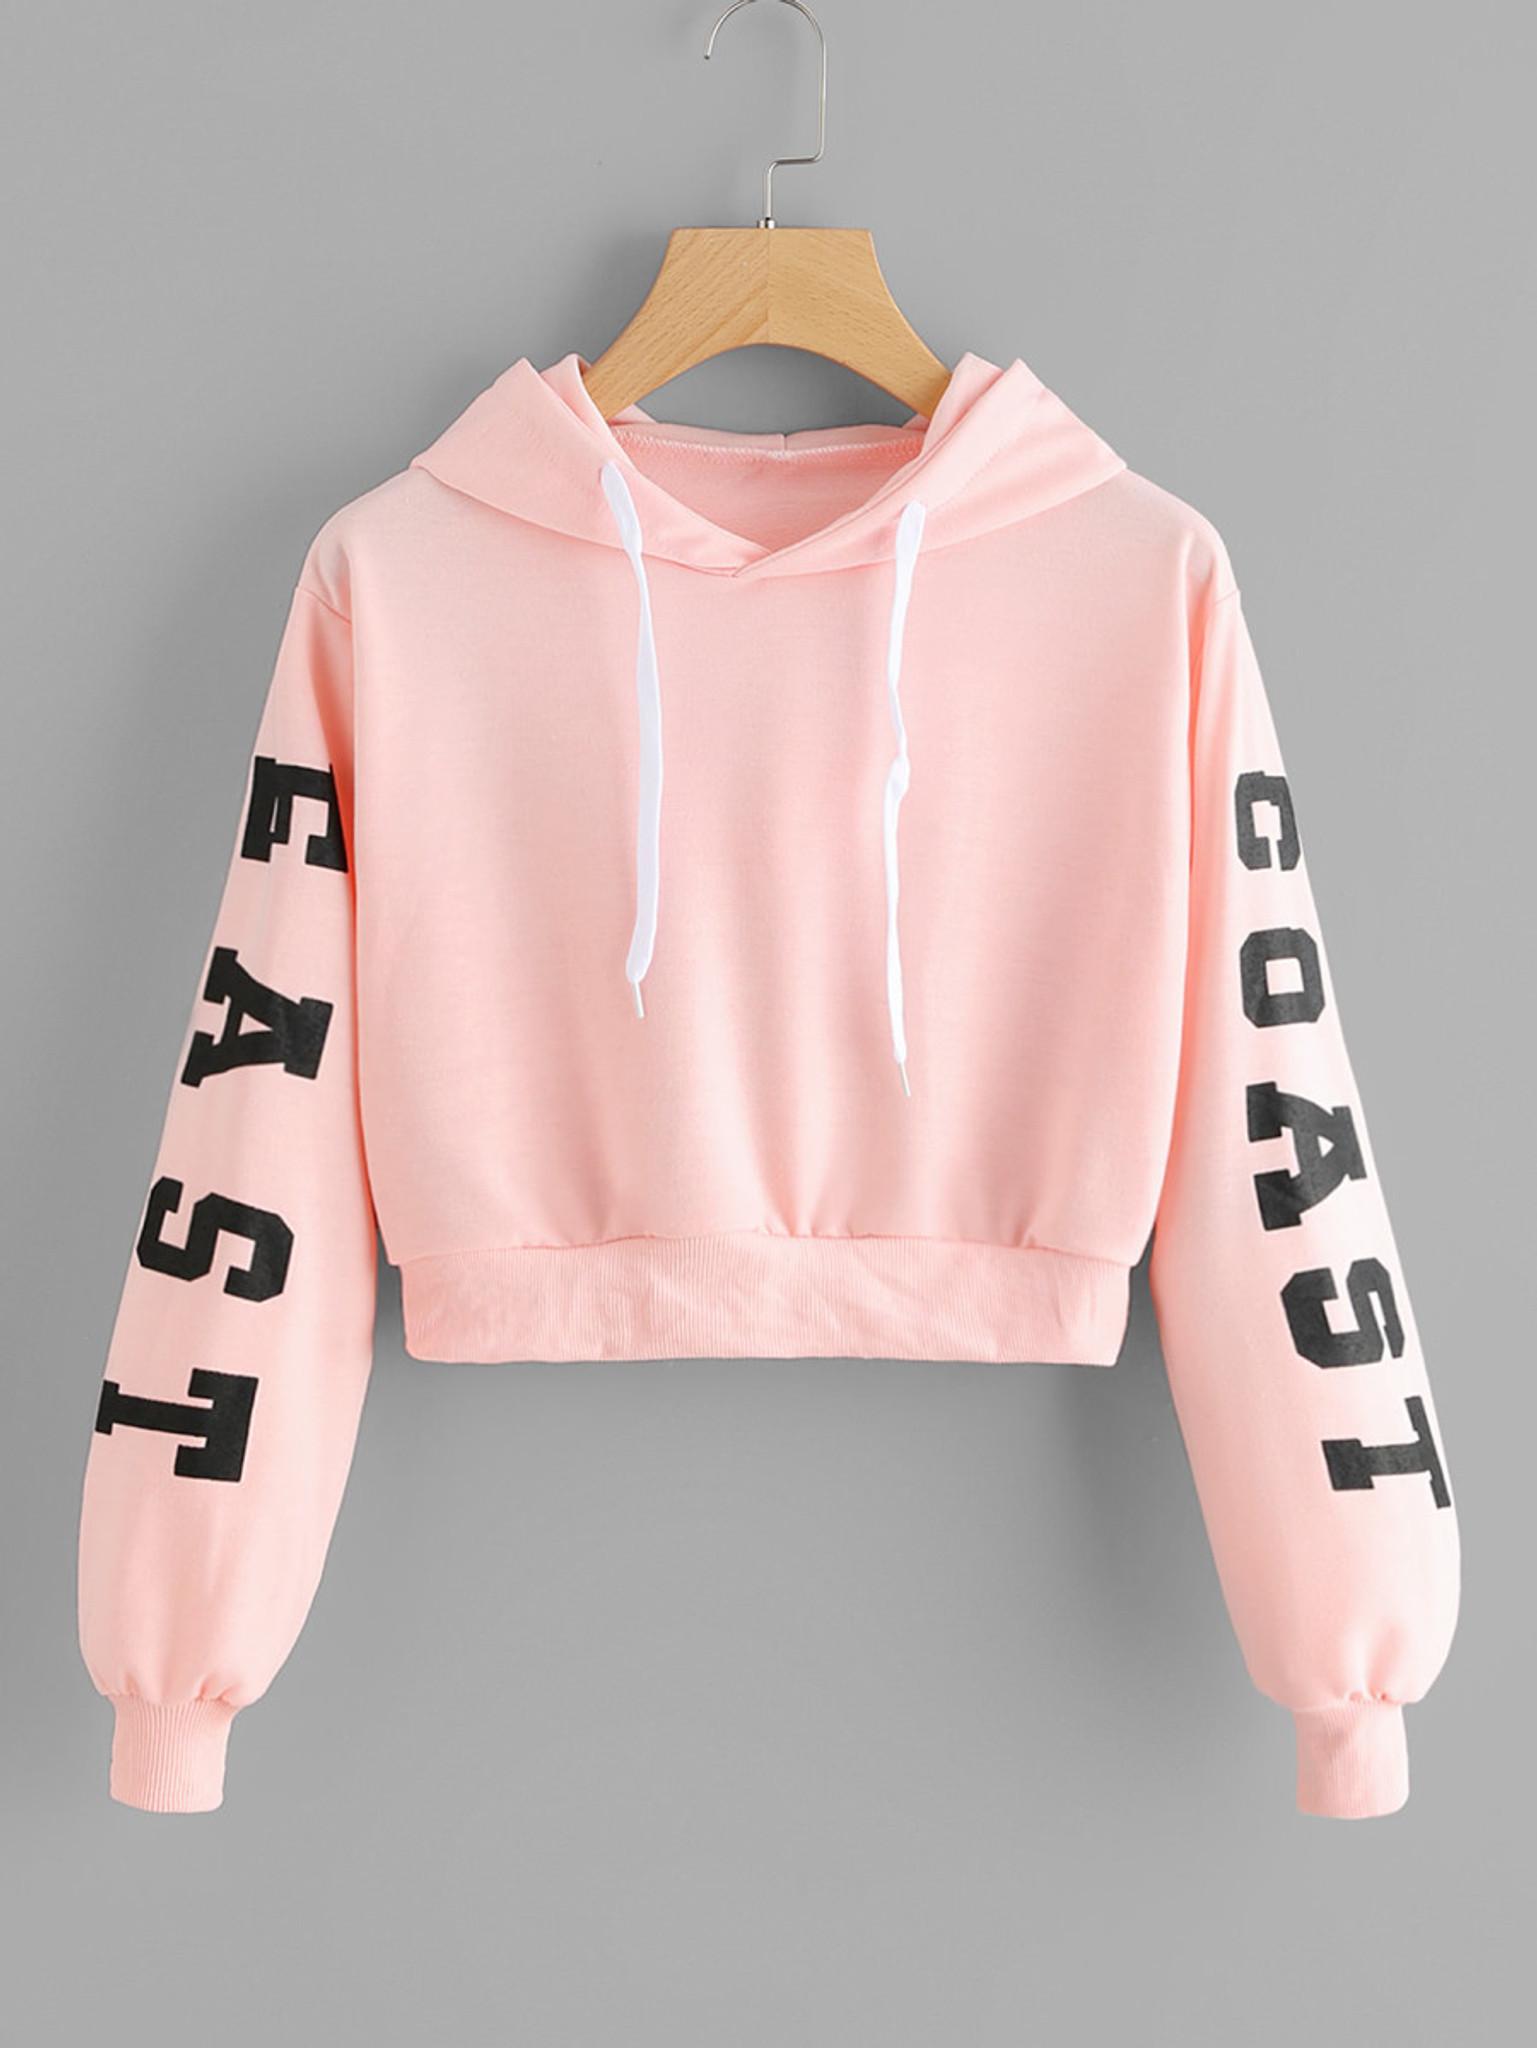 70b0c97fbc9 Fifth Avenue East Coast Sleeve Print Ribbed Cropped Hoodie - Pink